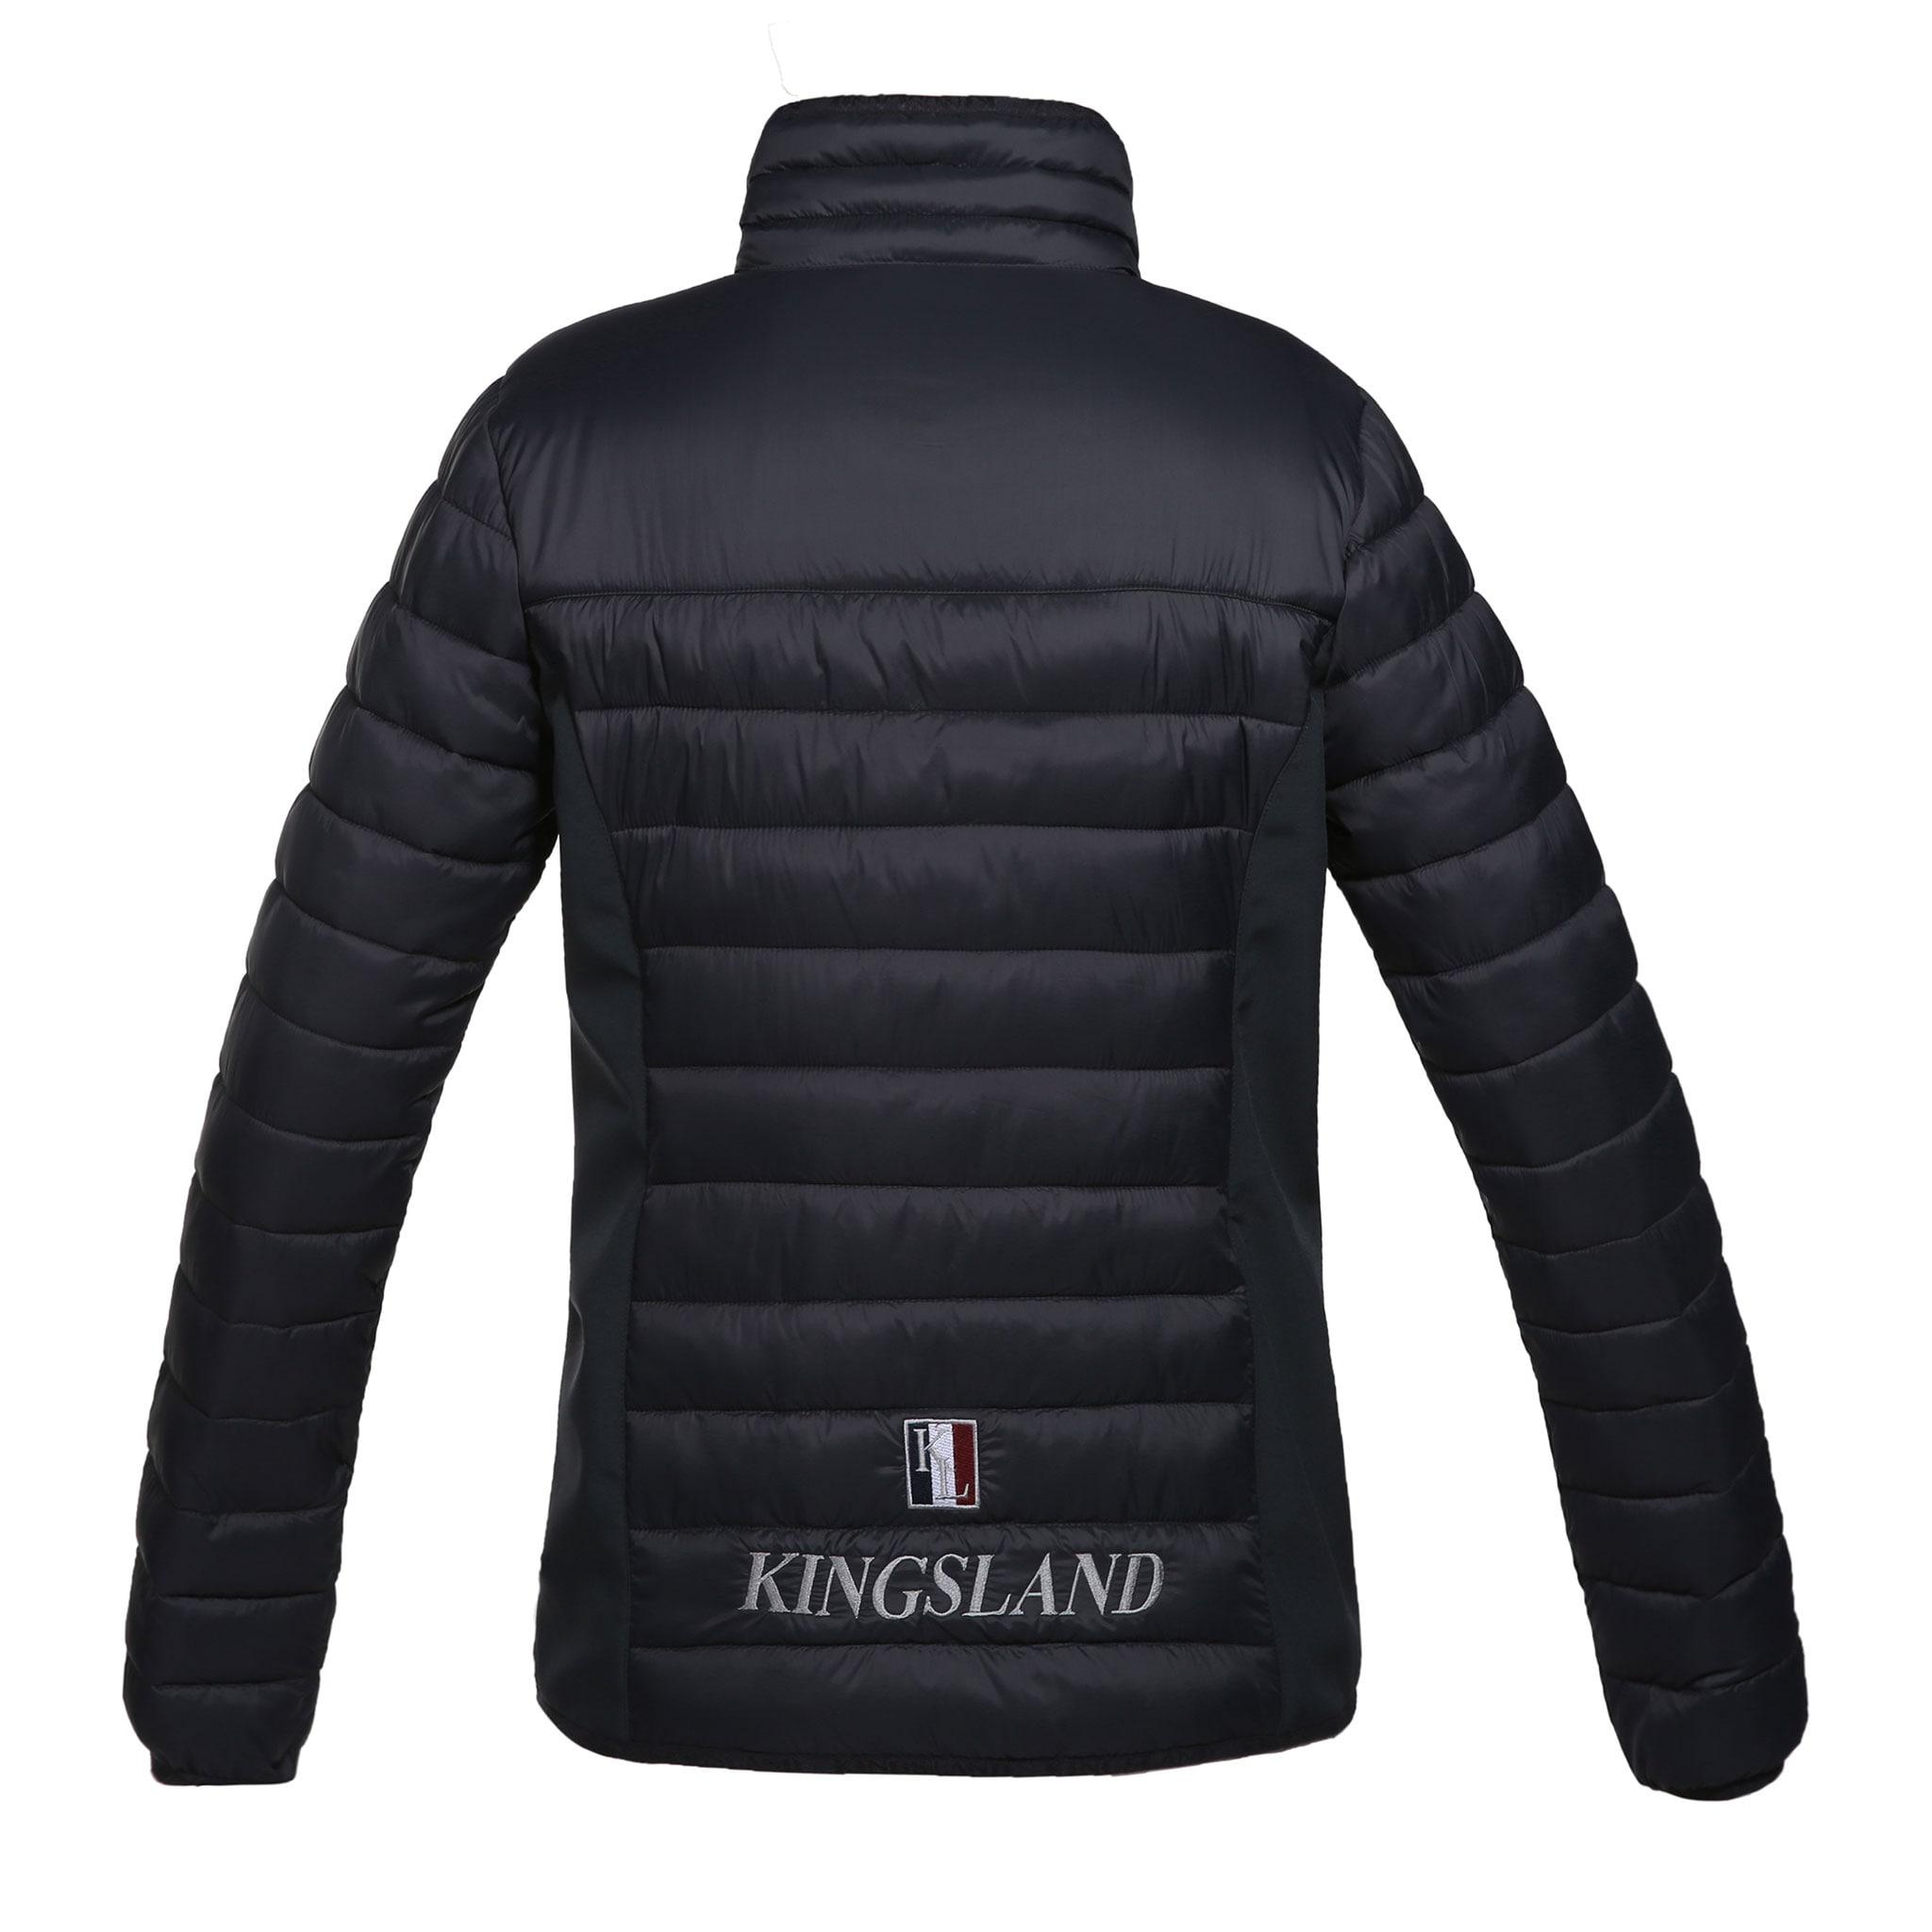 Kingsland Classic jakke, unisex